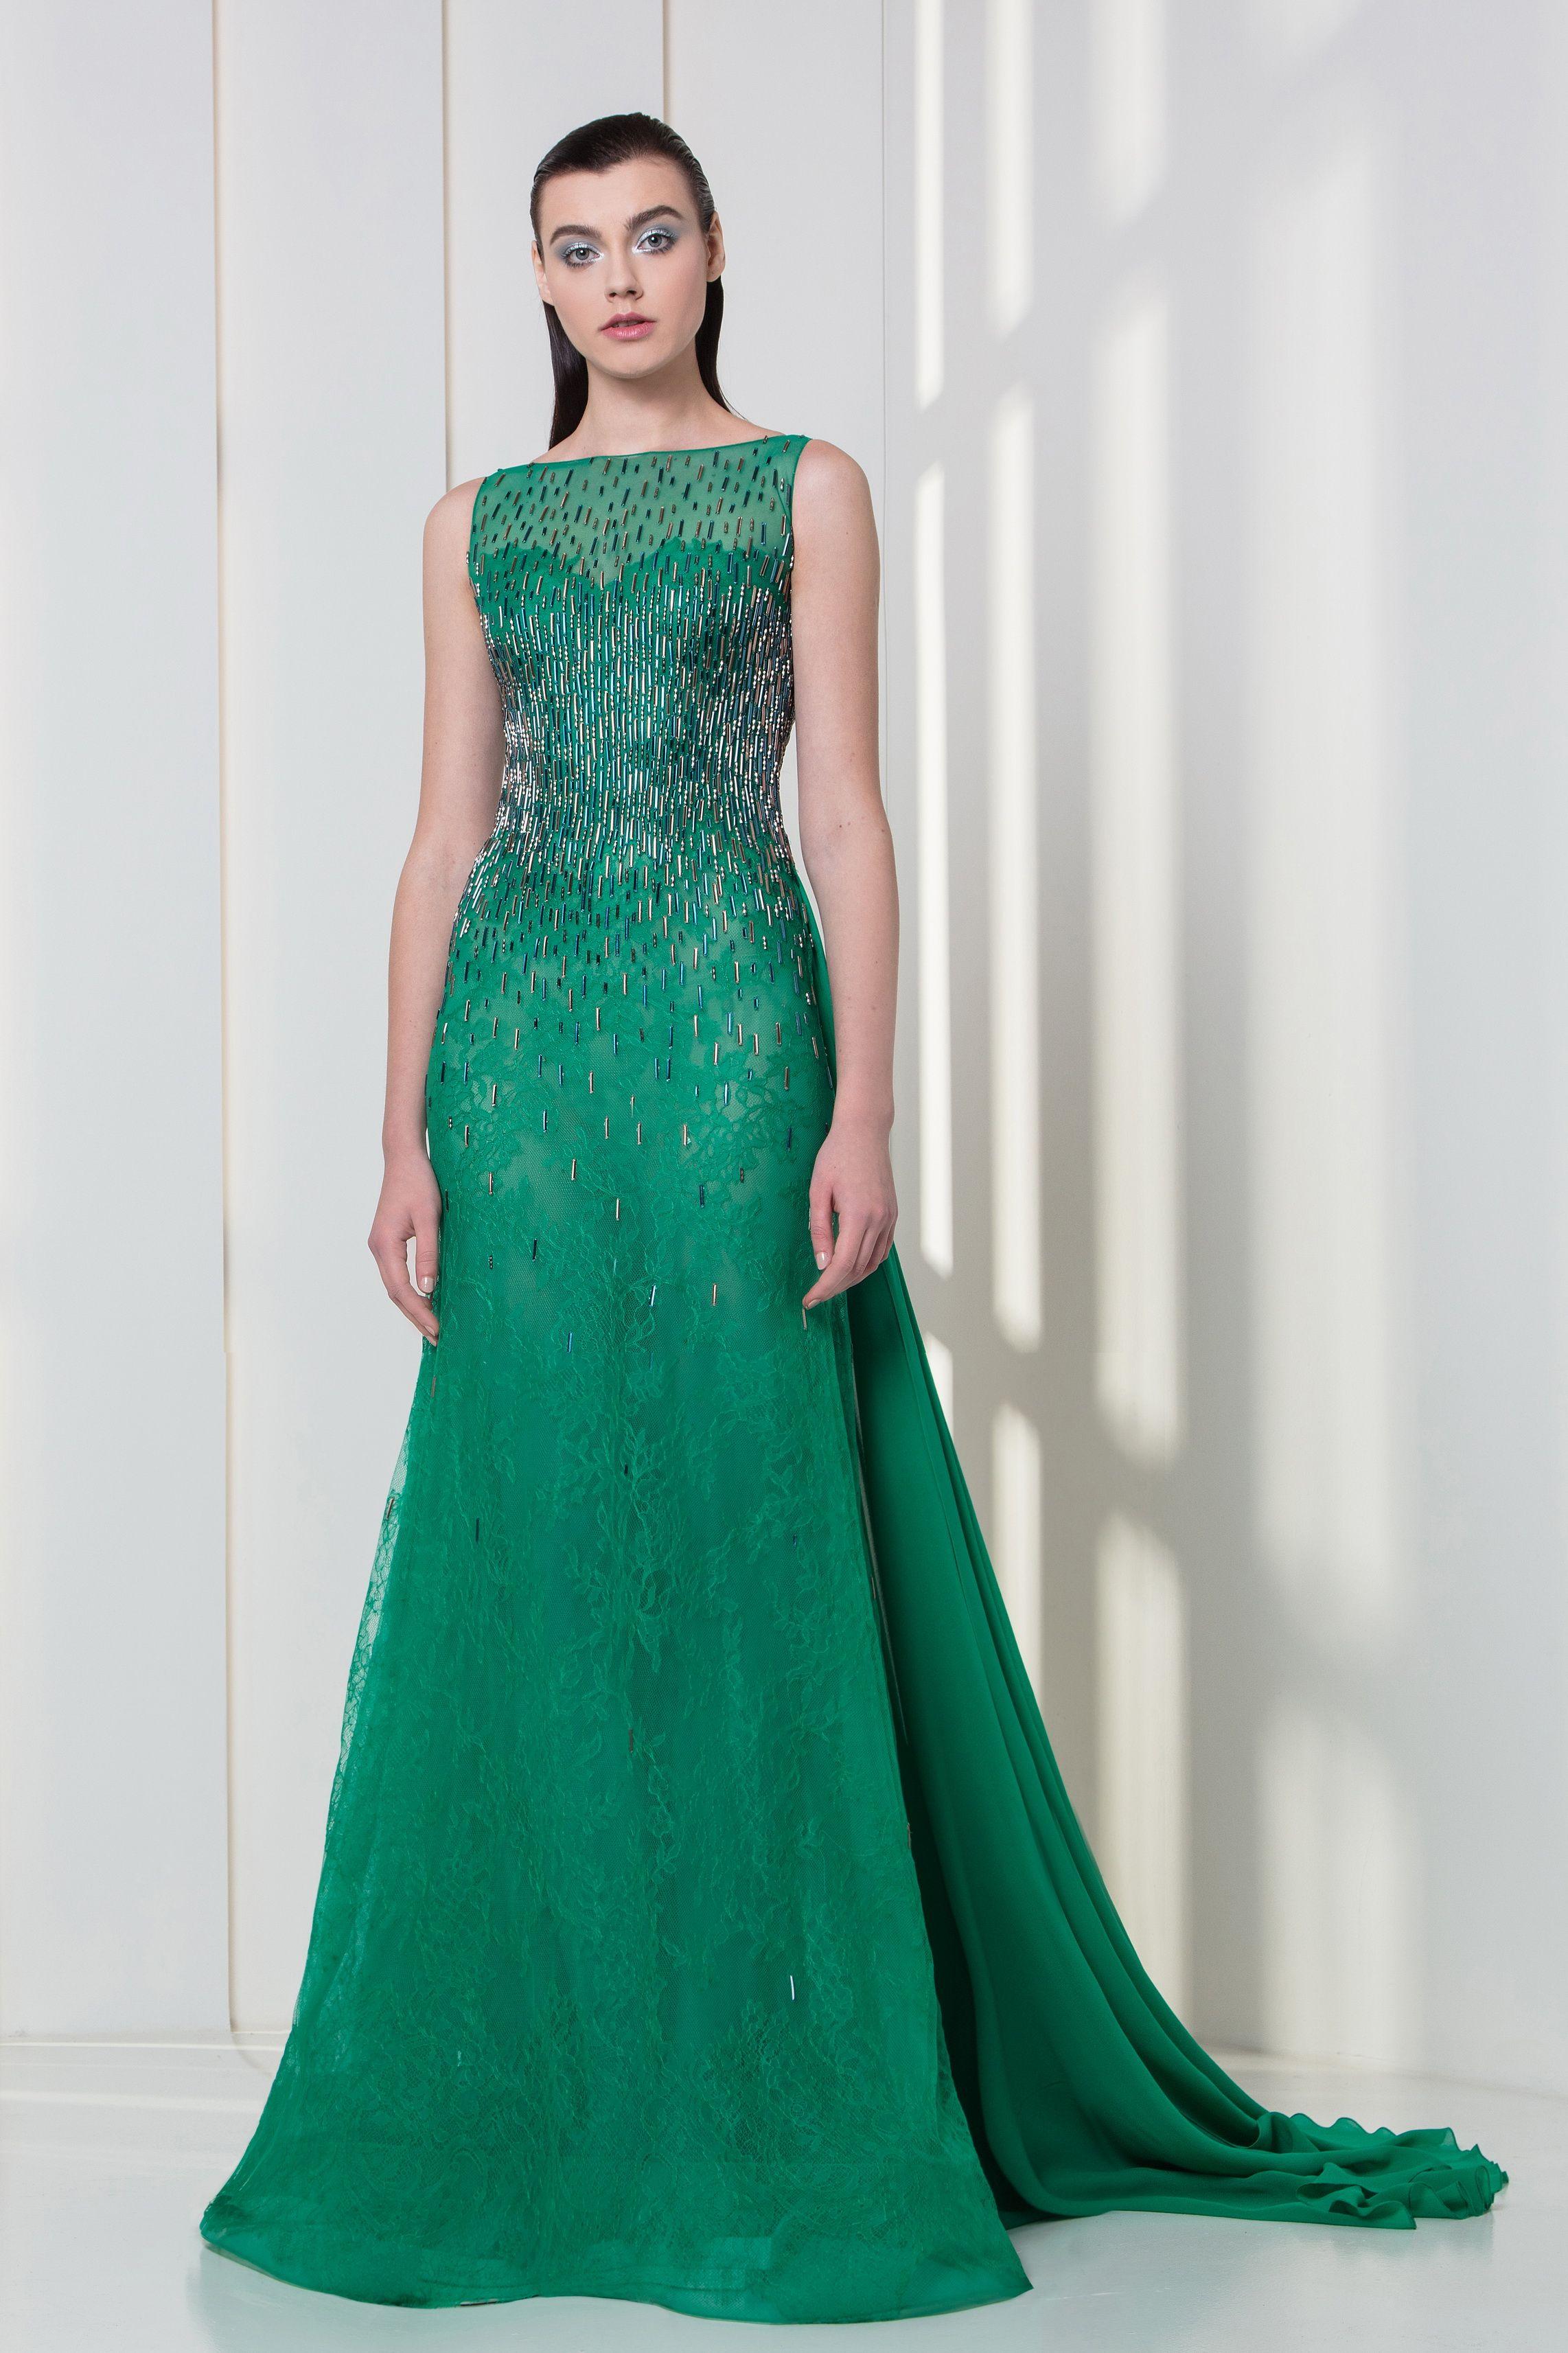 Tony Ward RTW FW 17/18 I Style 22 I Emerald Georgette crepe and lace ...